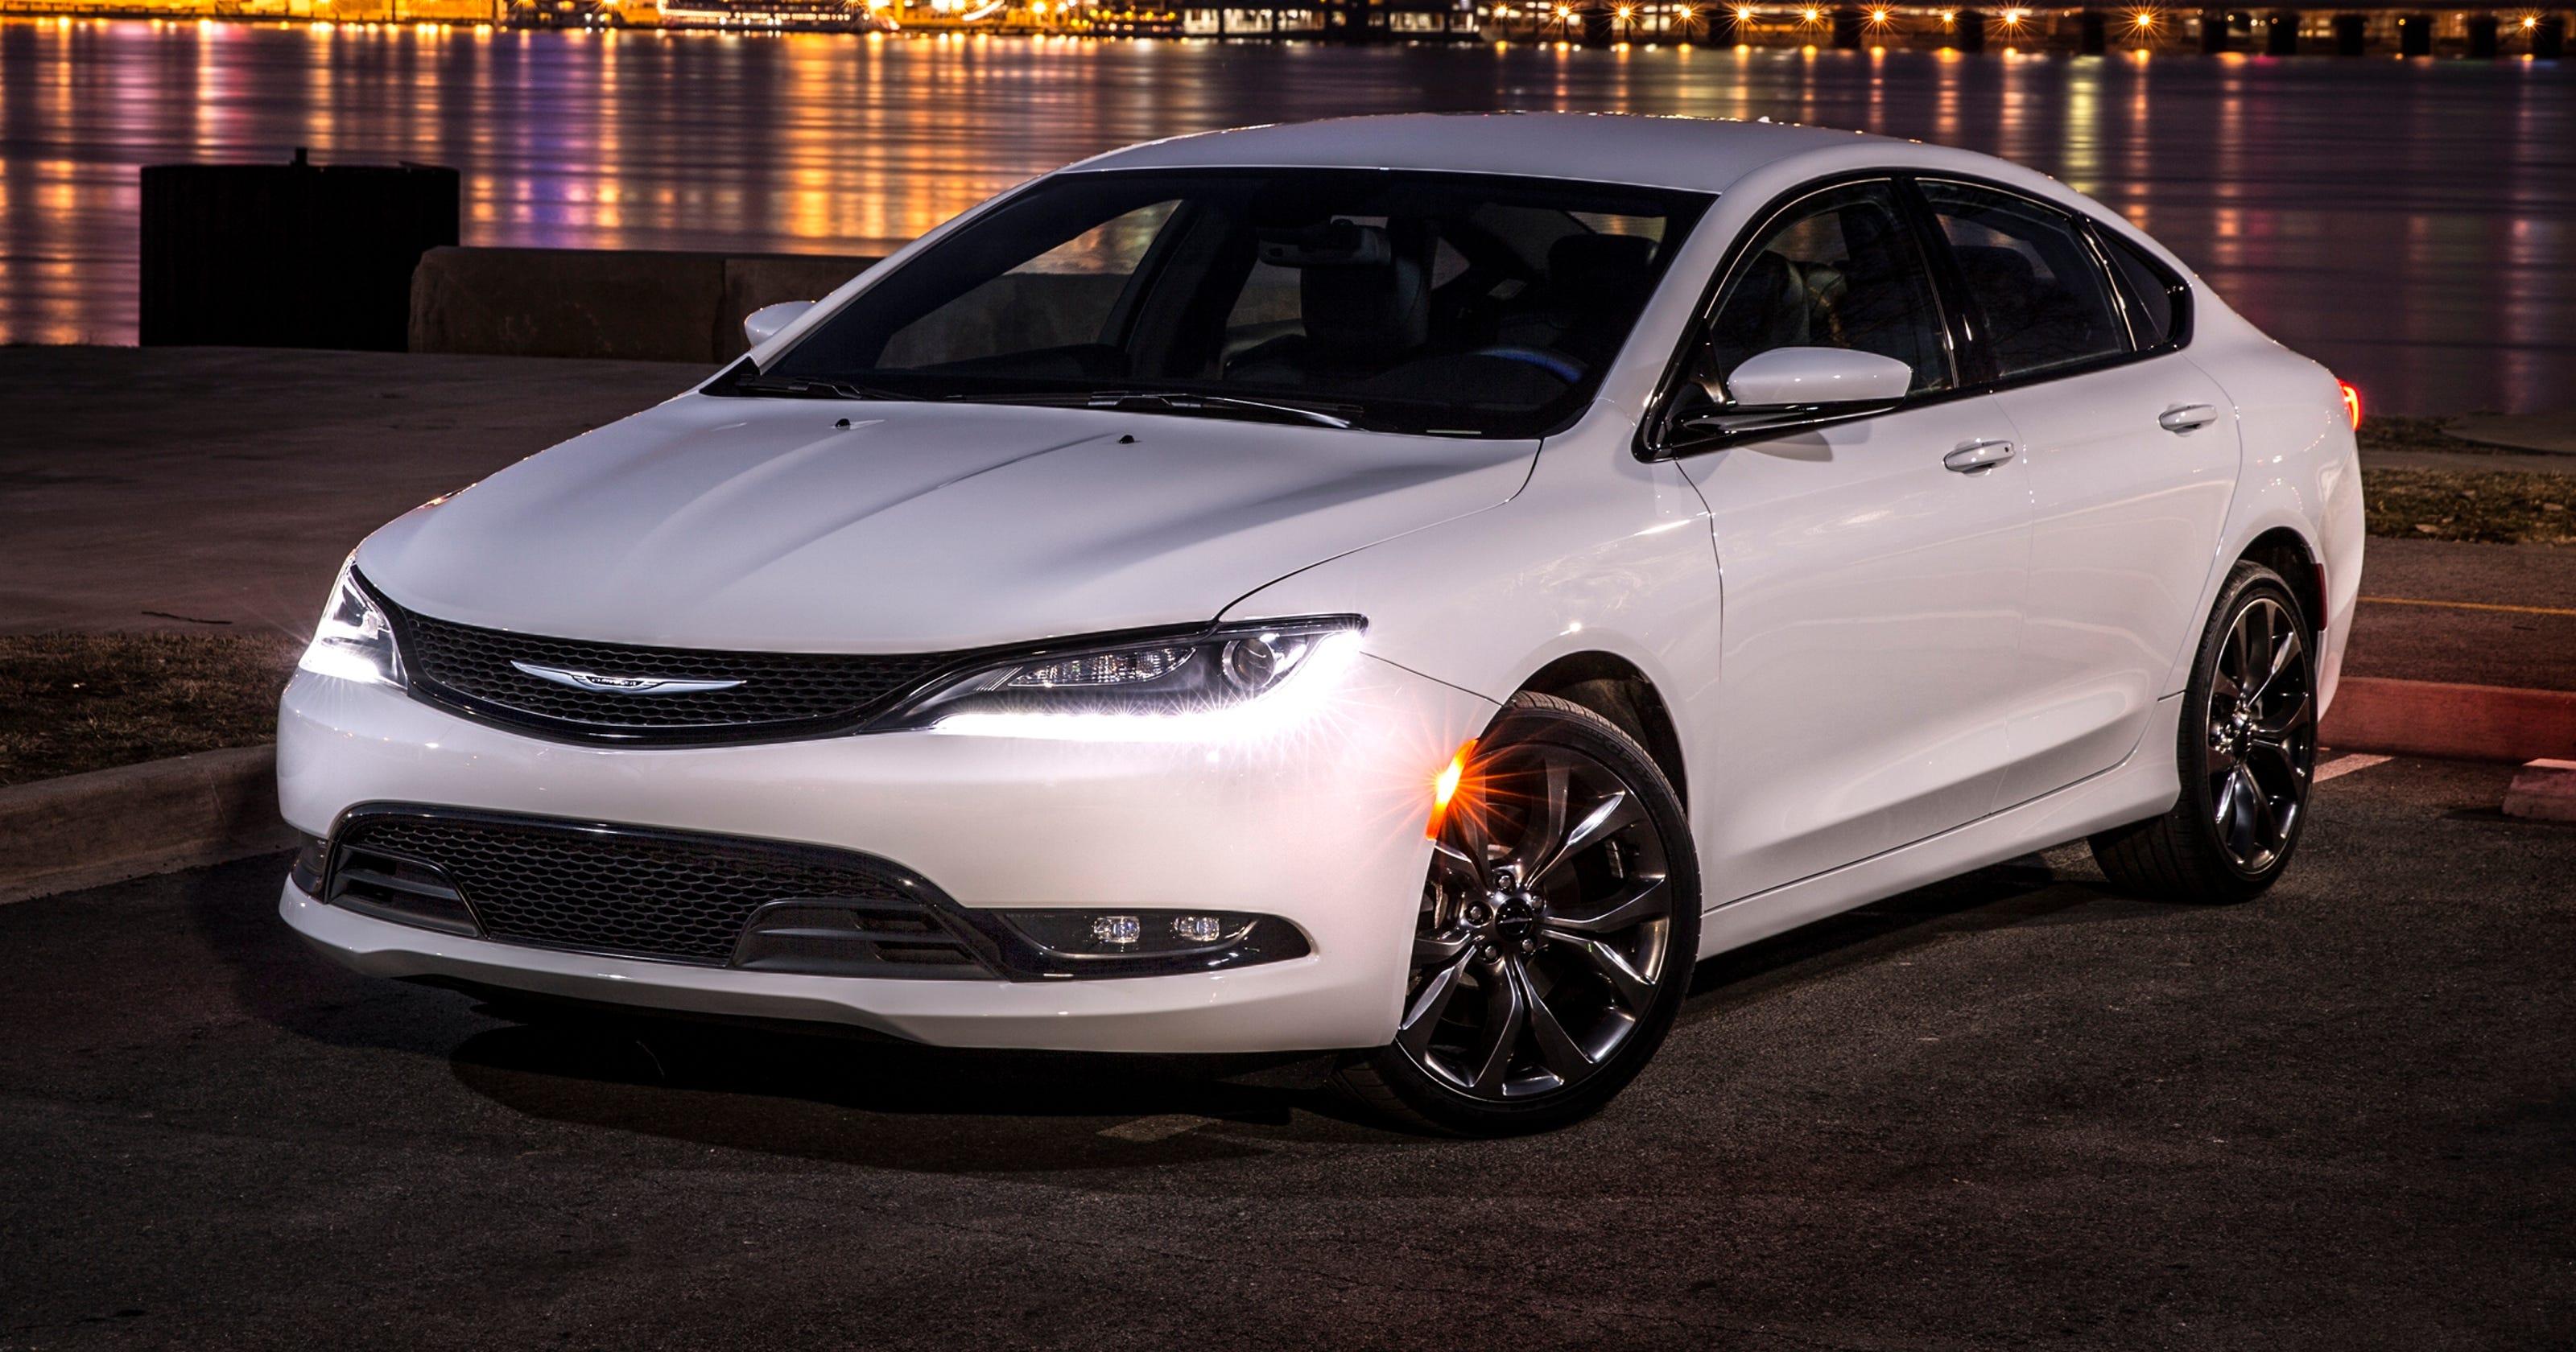 Chrysler 200 recalled: Won't go into park